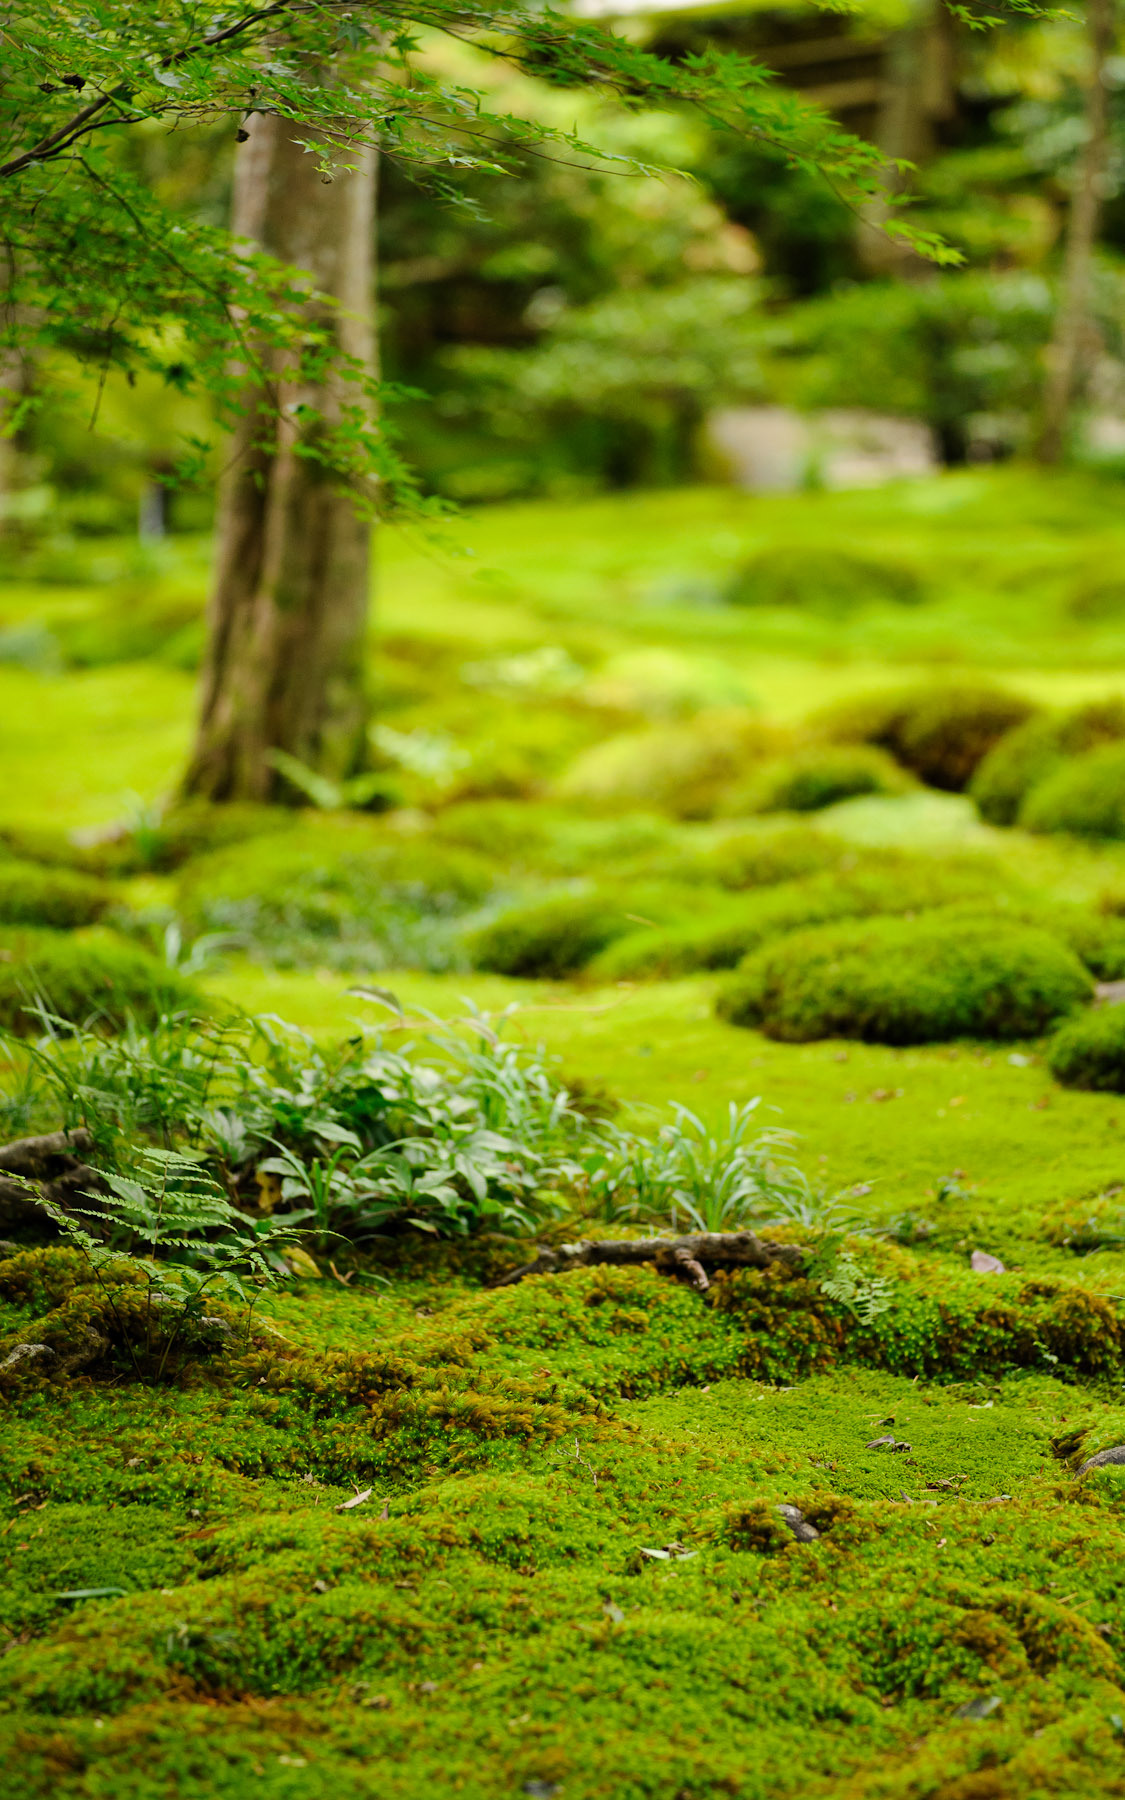 Moss Garden, Gioji Temple, Japan Photo: Jeffrey Friedl, July 2012